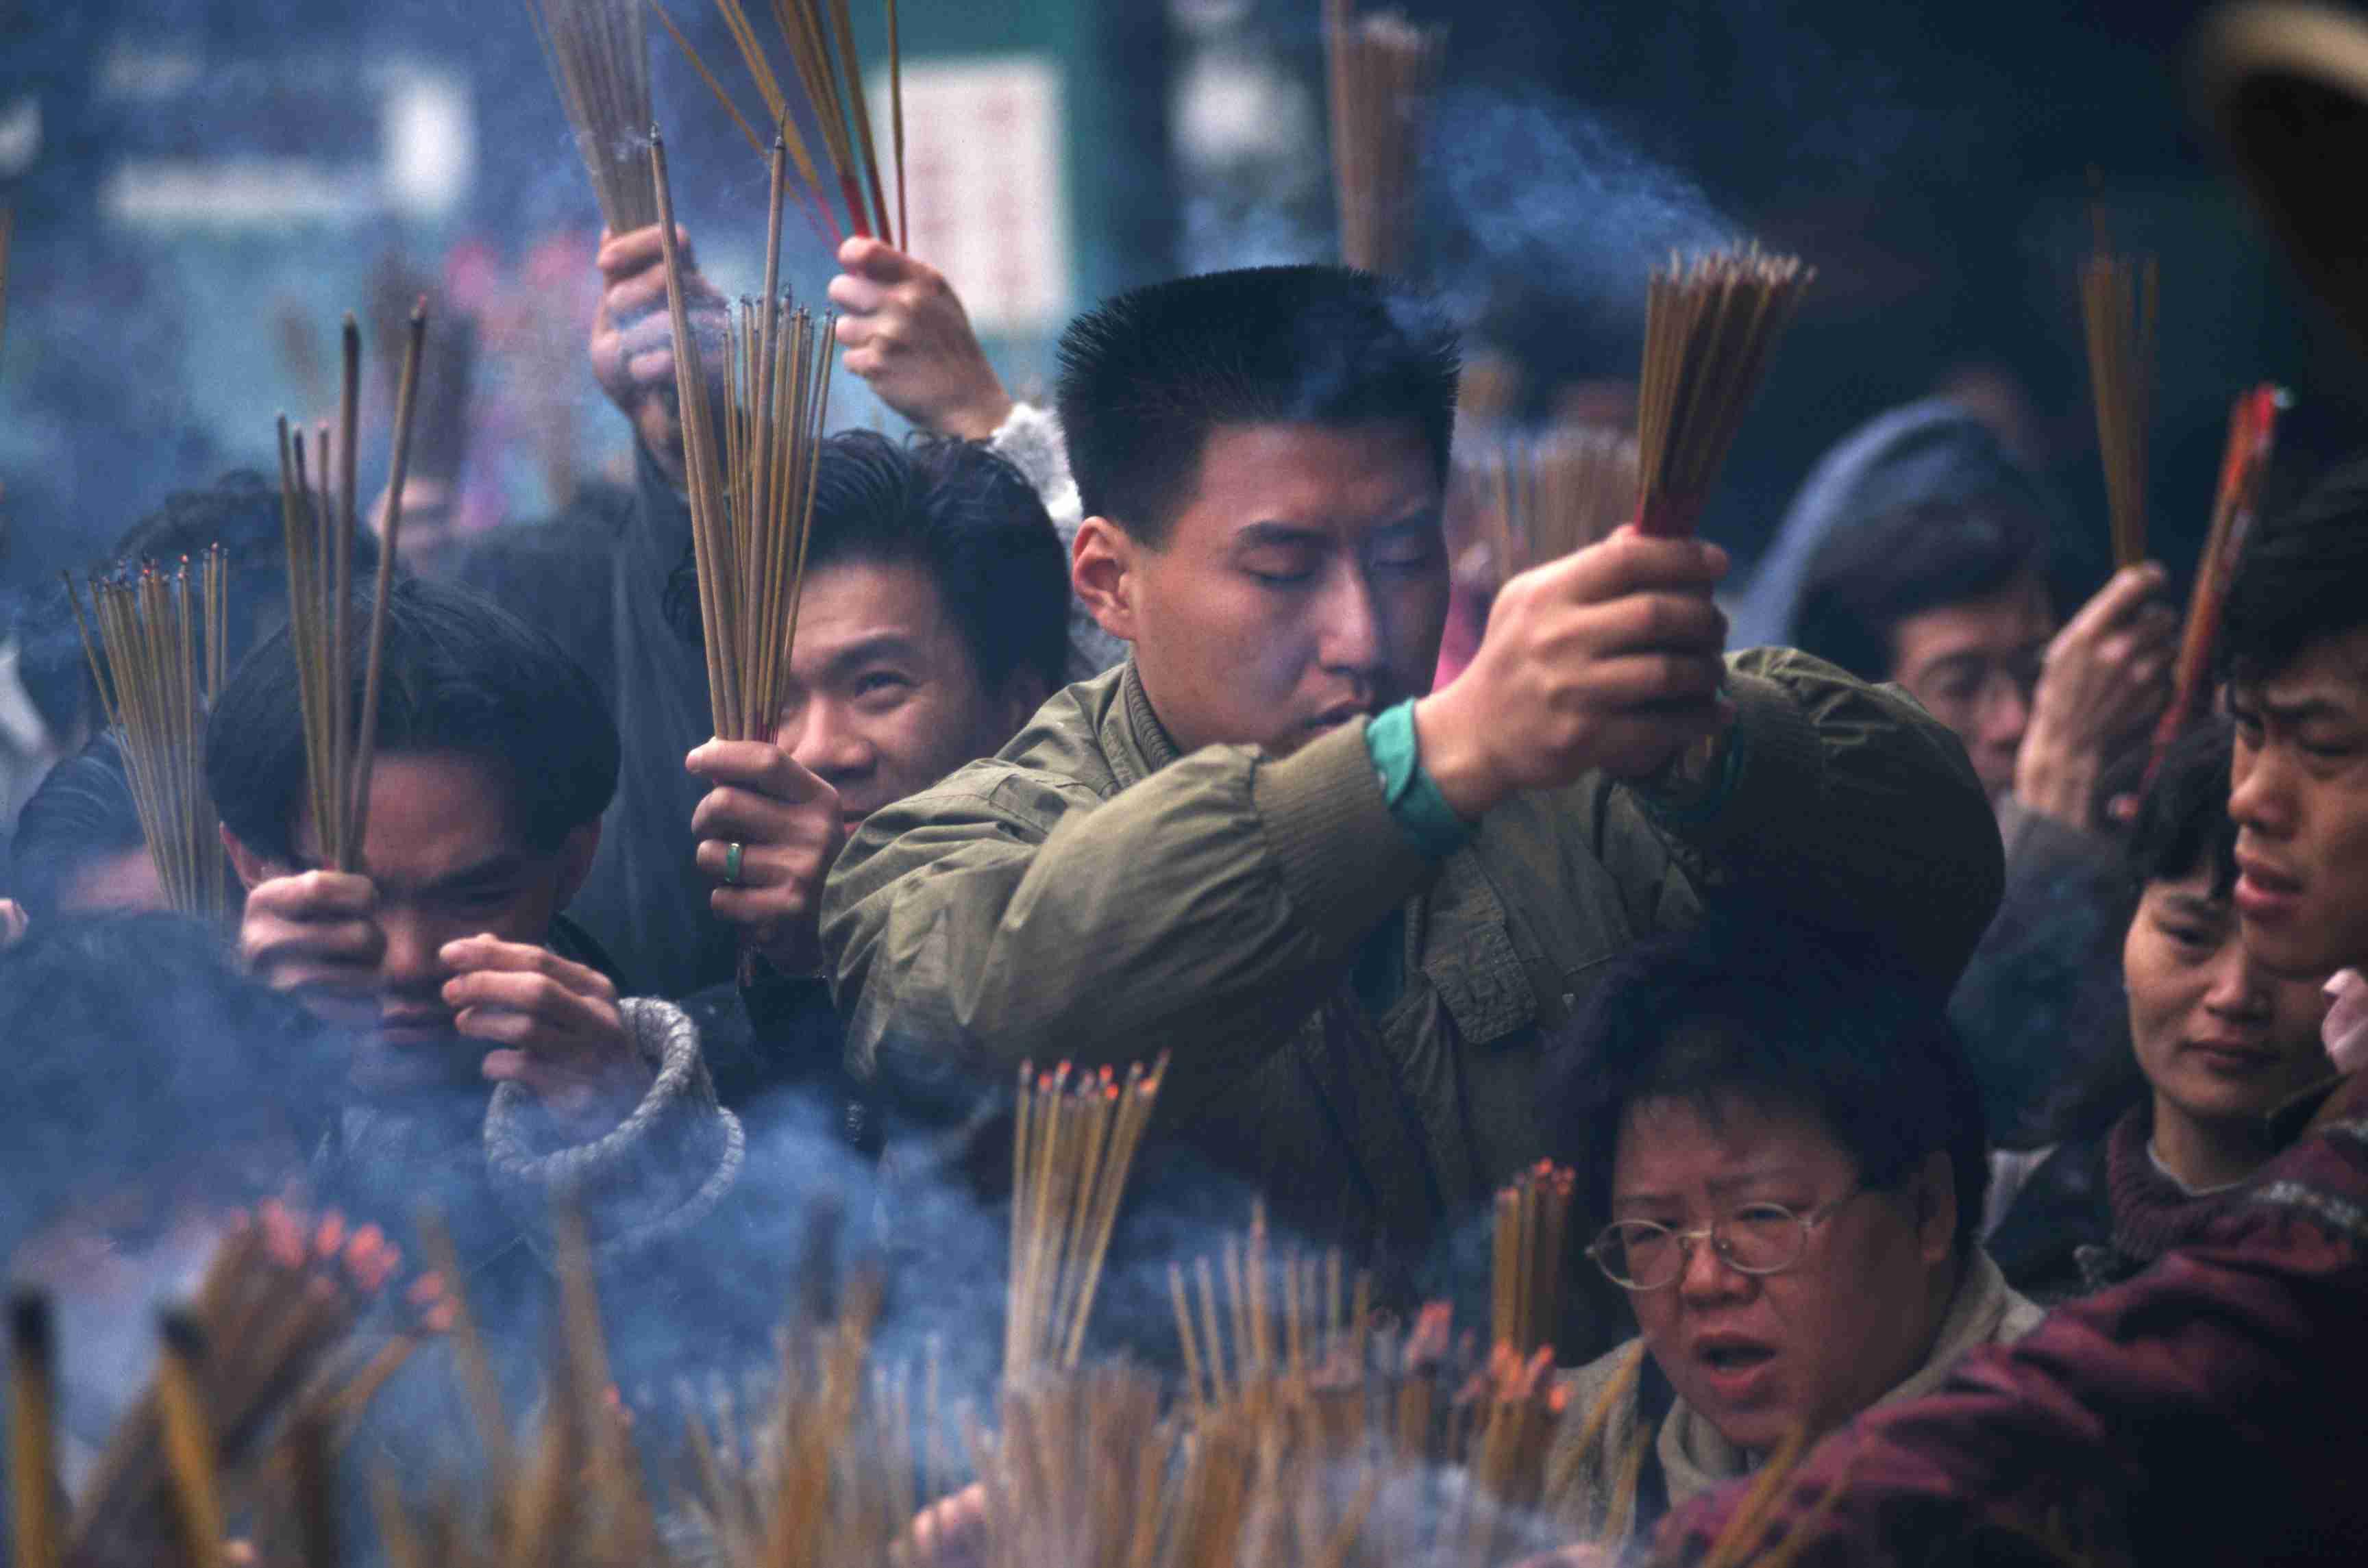 Worshipers at Wong Tai Sin Temple in Hong Kong during the Chinese New Year